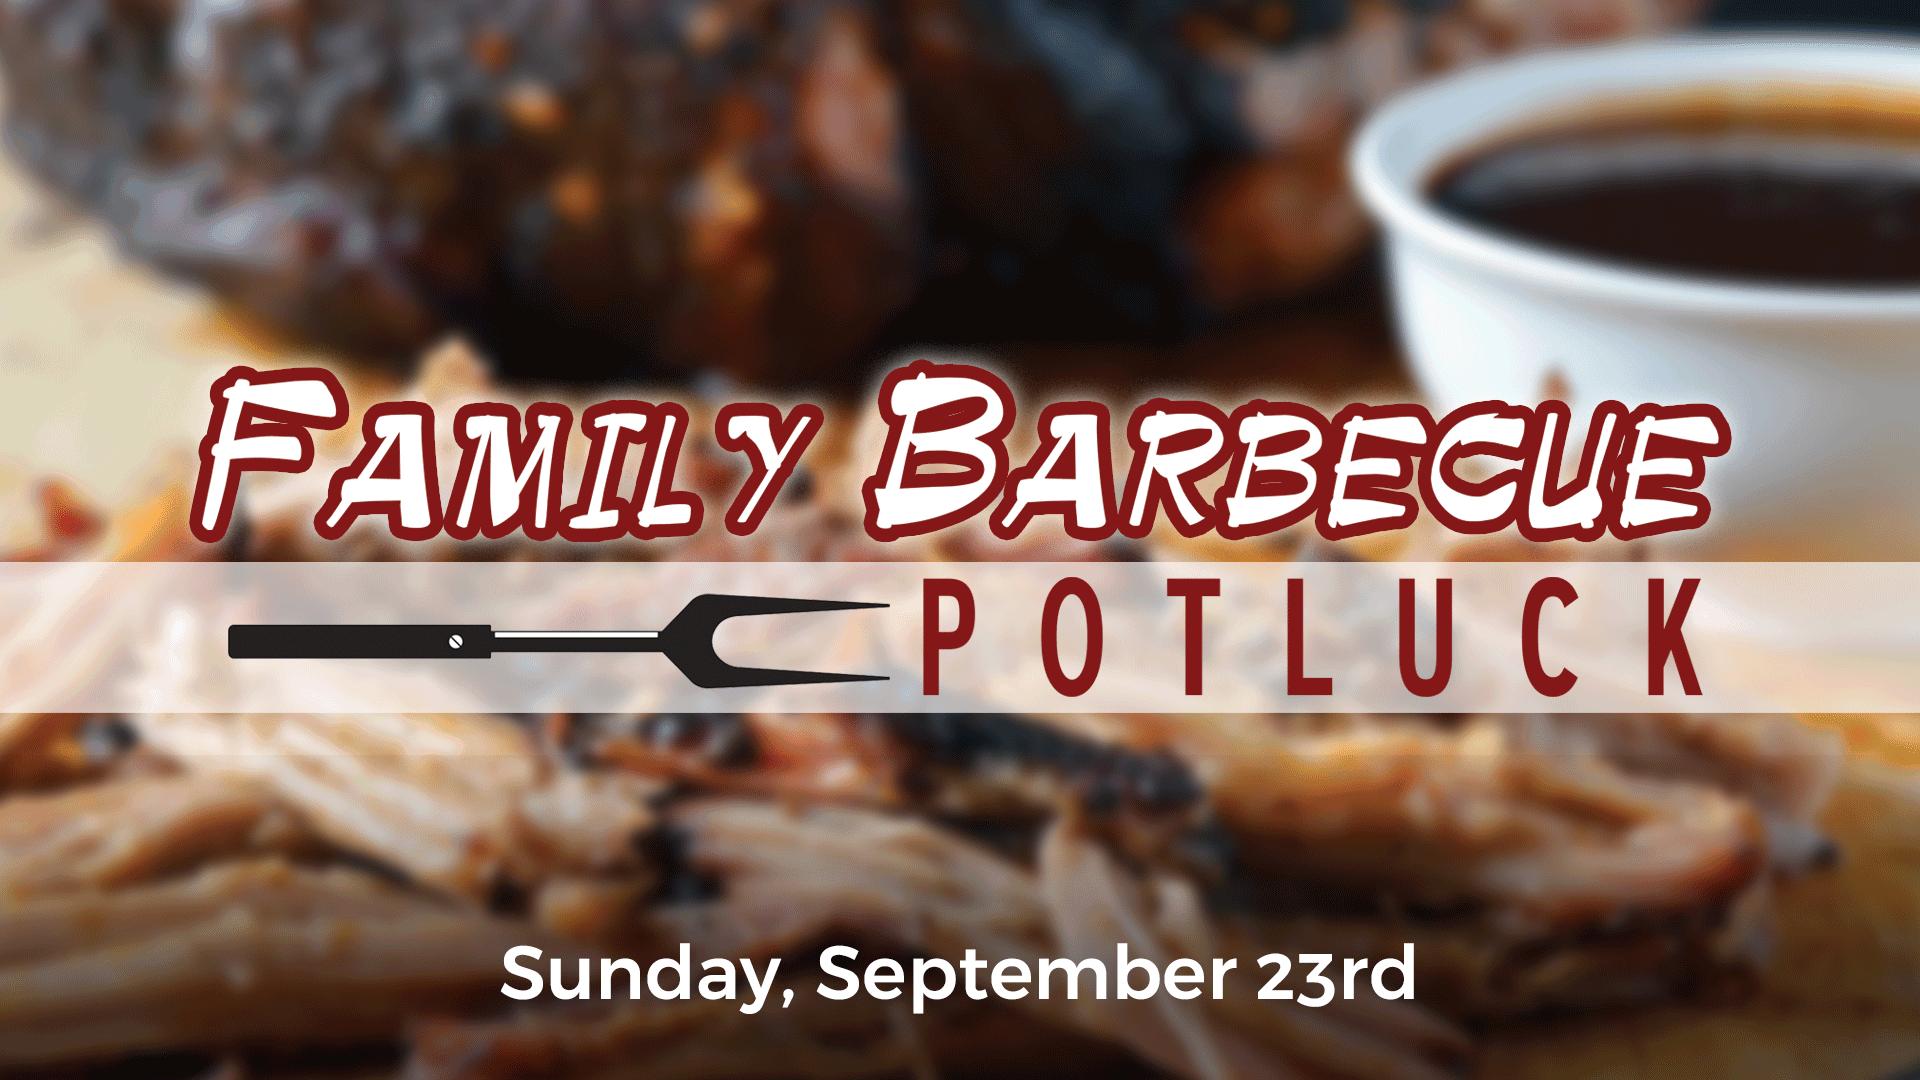 Family-BBQ-Potluck